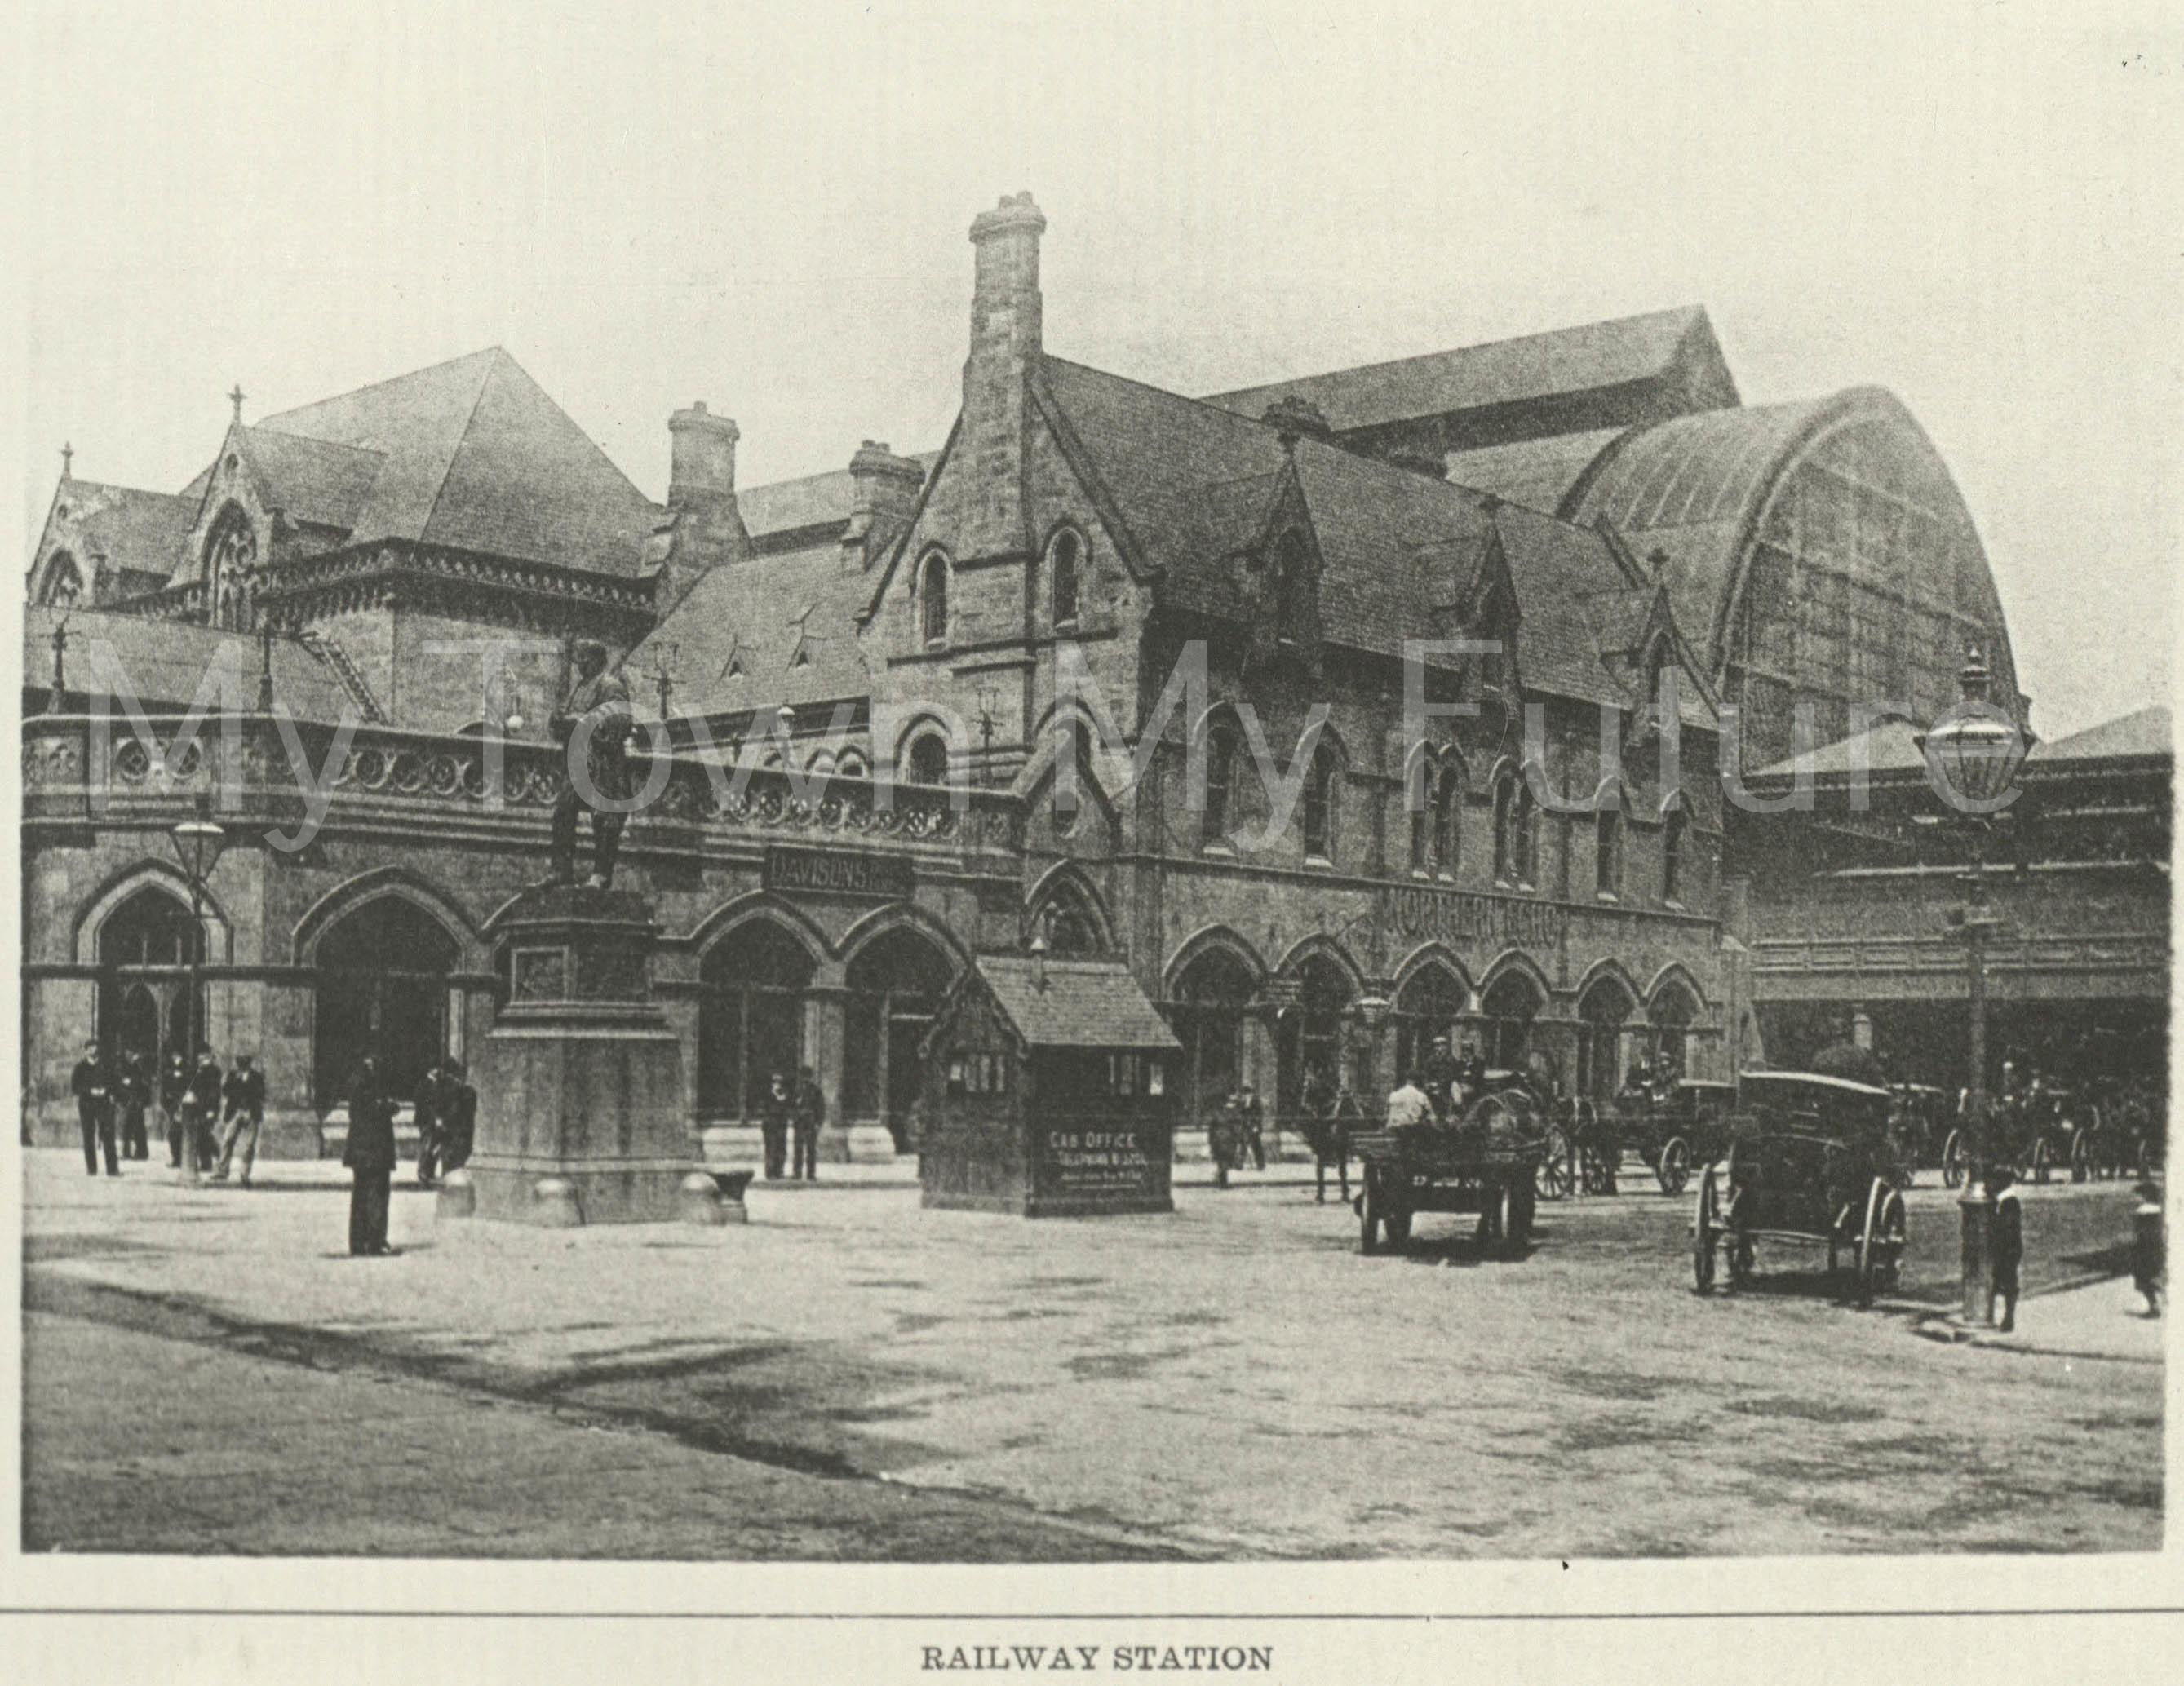 Middlesbrough Railway Station - 1900